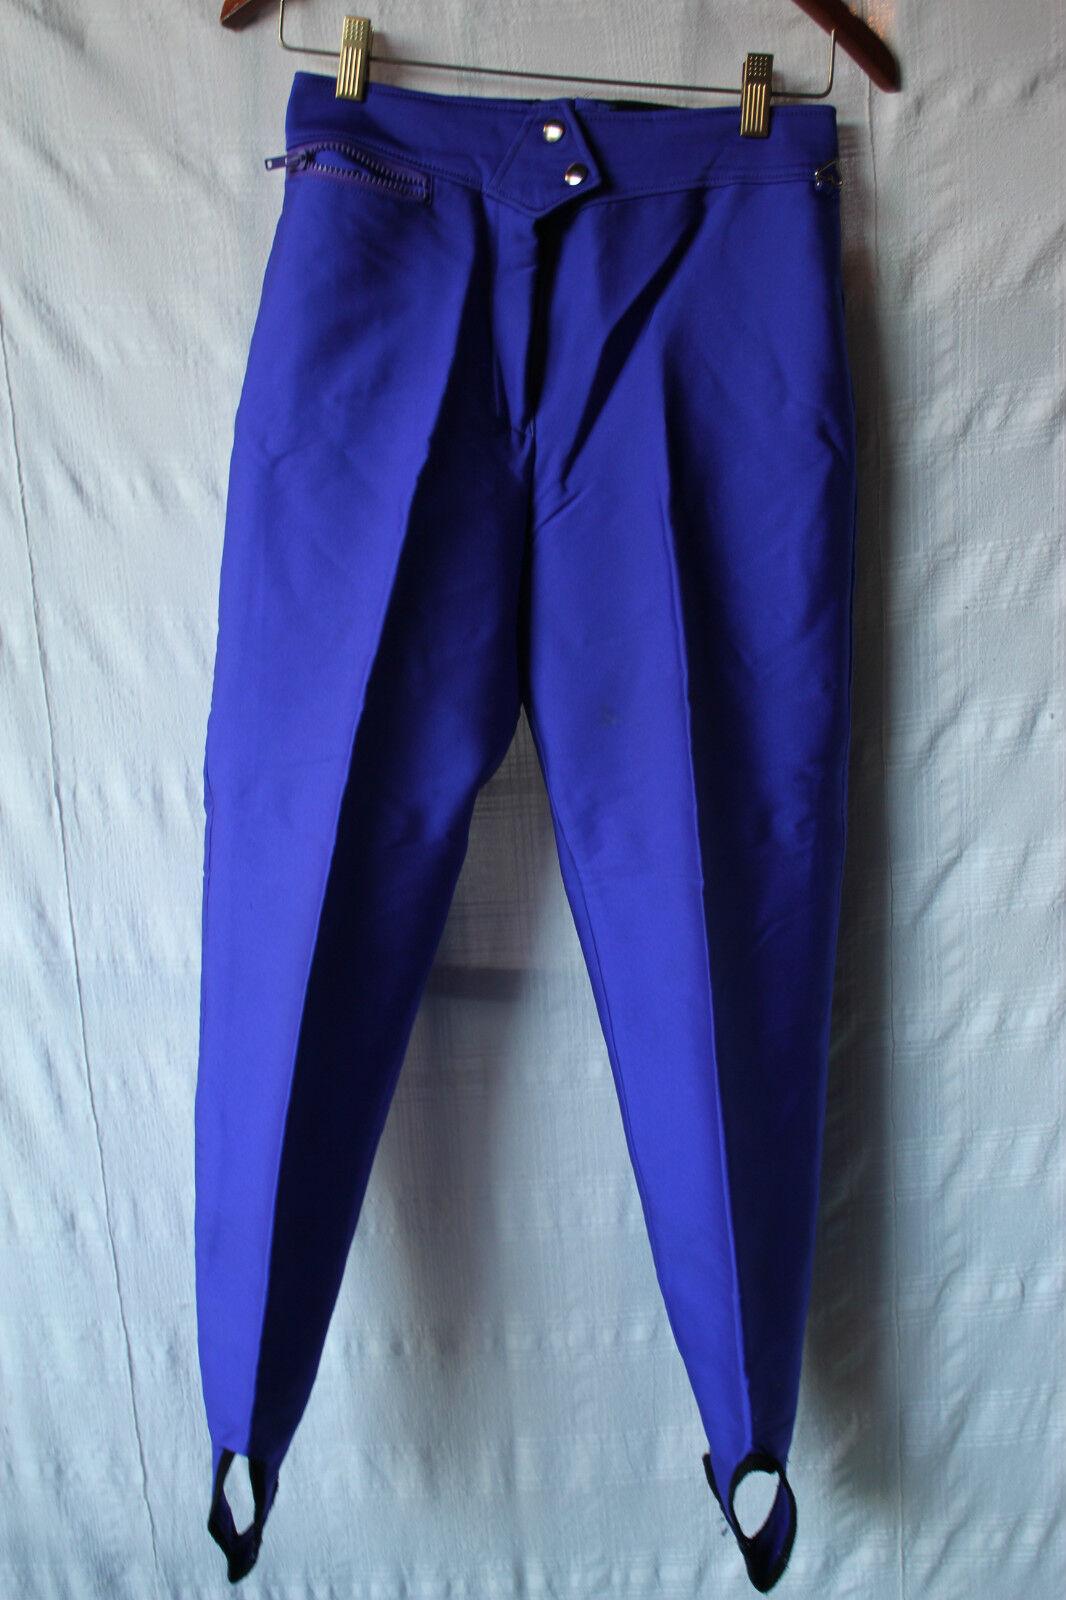 Obermeyer Sports wear Womens Stretch Ski Snow  Pants Purple  take up to 70% off